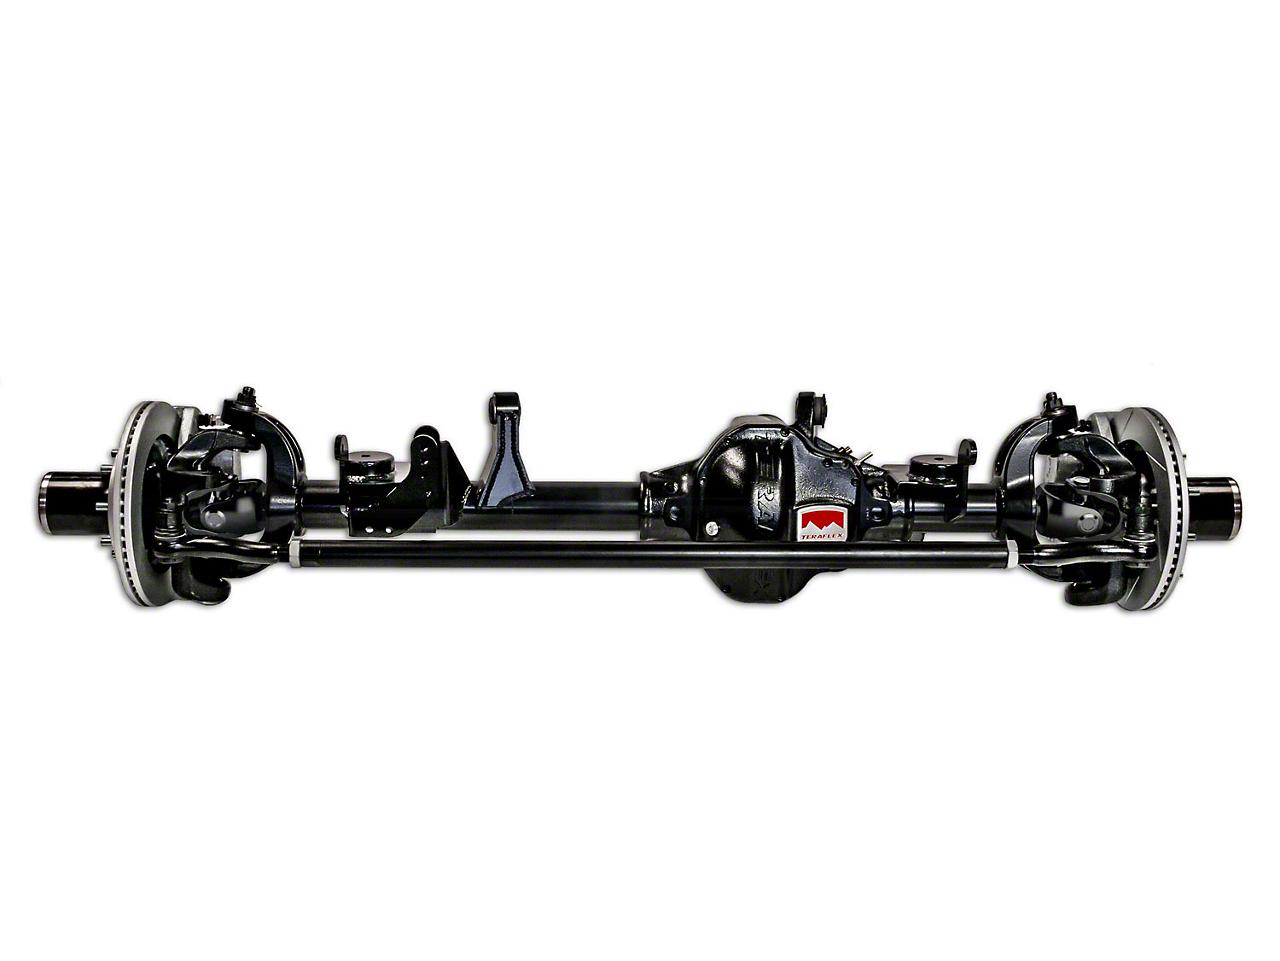 Teraflex Front Tera60 Axle w/ Locking Hubs & 4.88 Gears (97-06 Wrangler TJ)